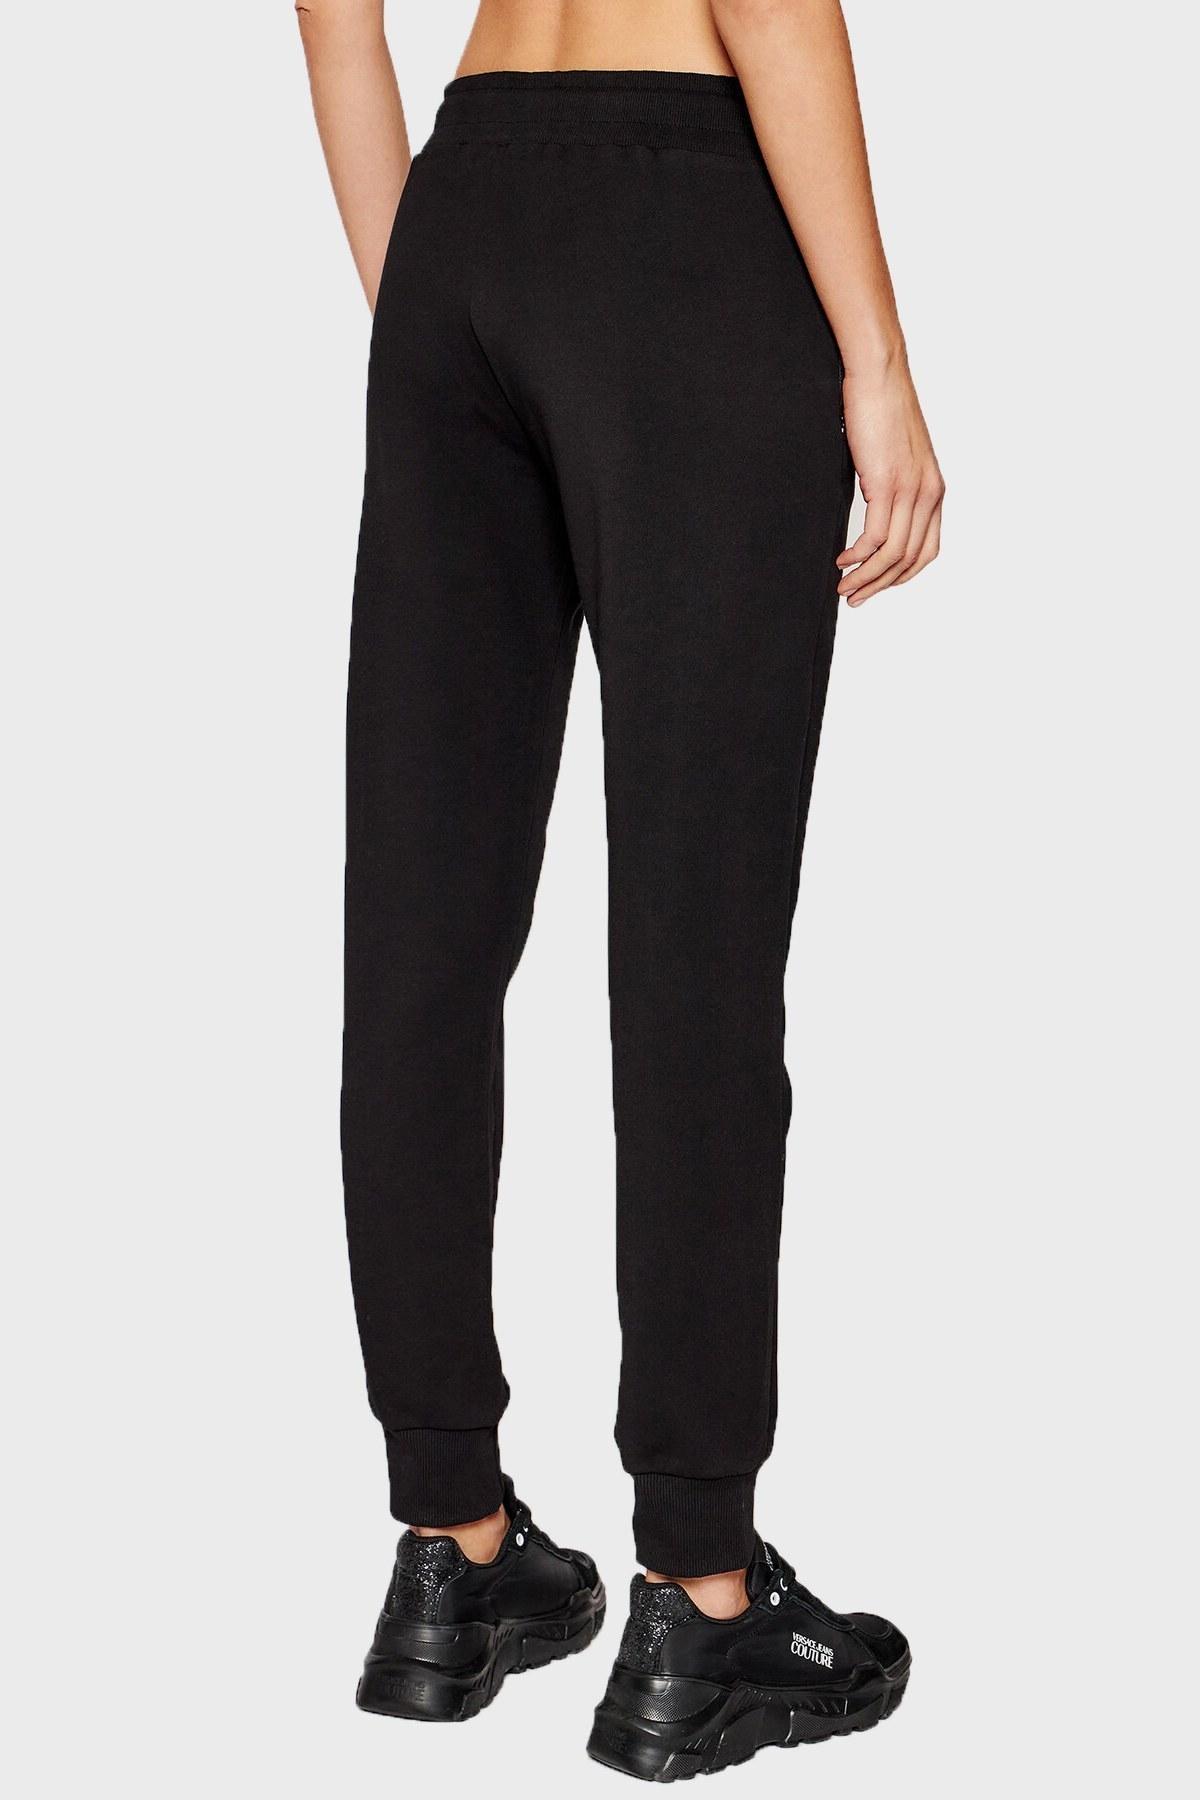 Versace Jeans Couture Bayan Eşofman Altı A1HWA1TA 30318 K42 SİYAH